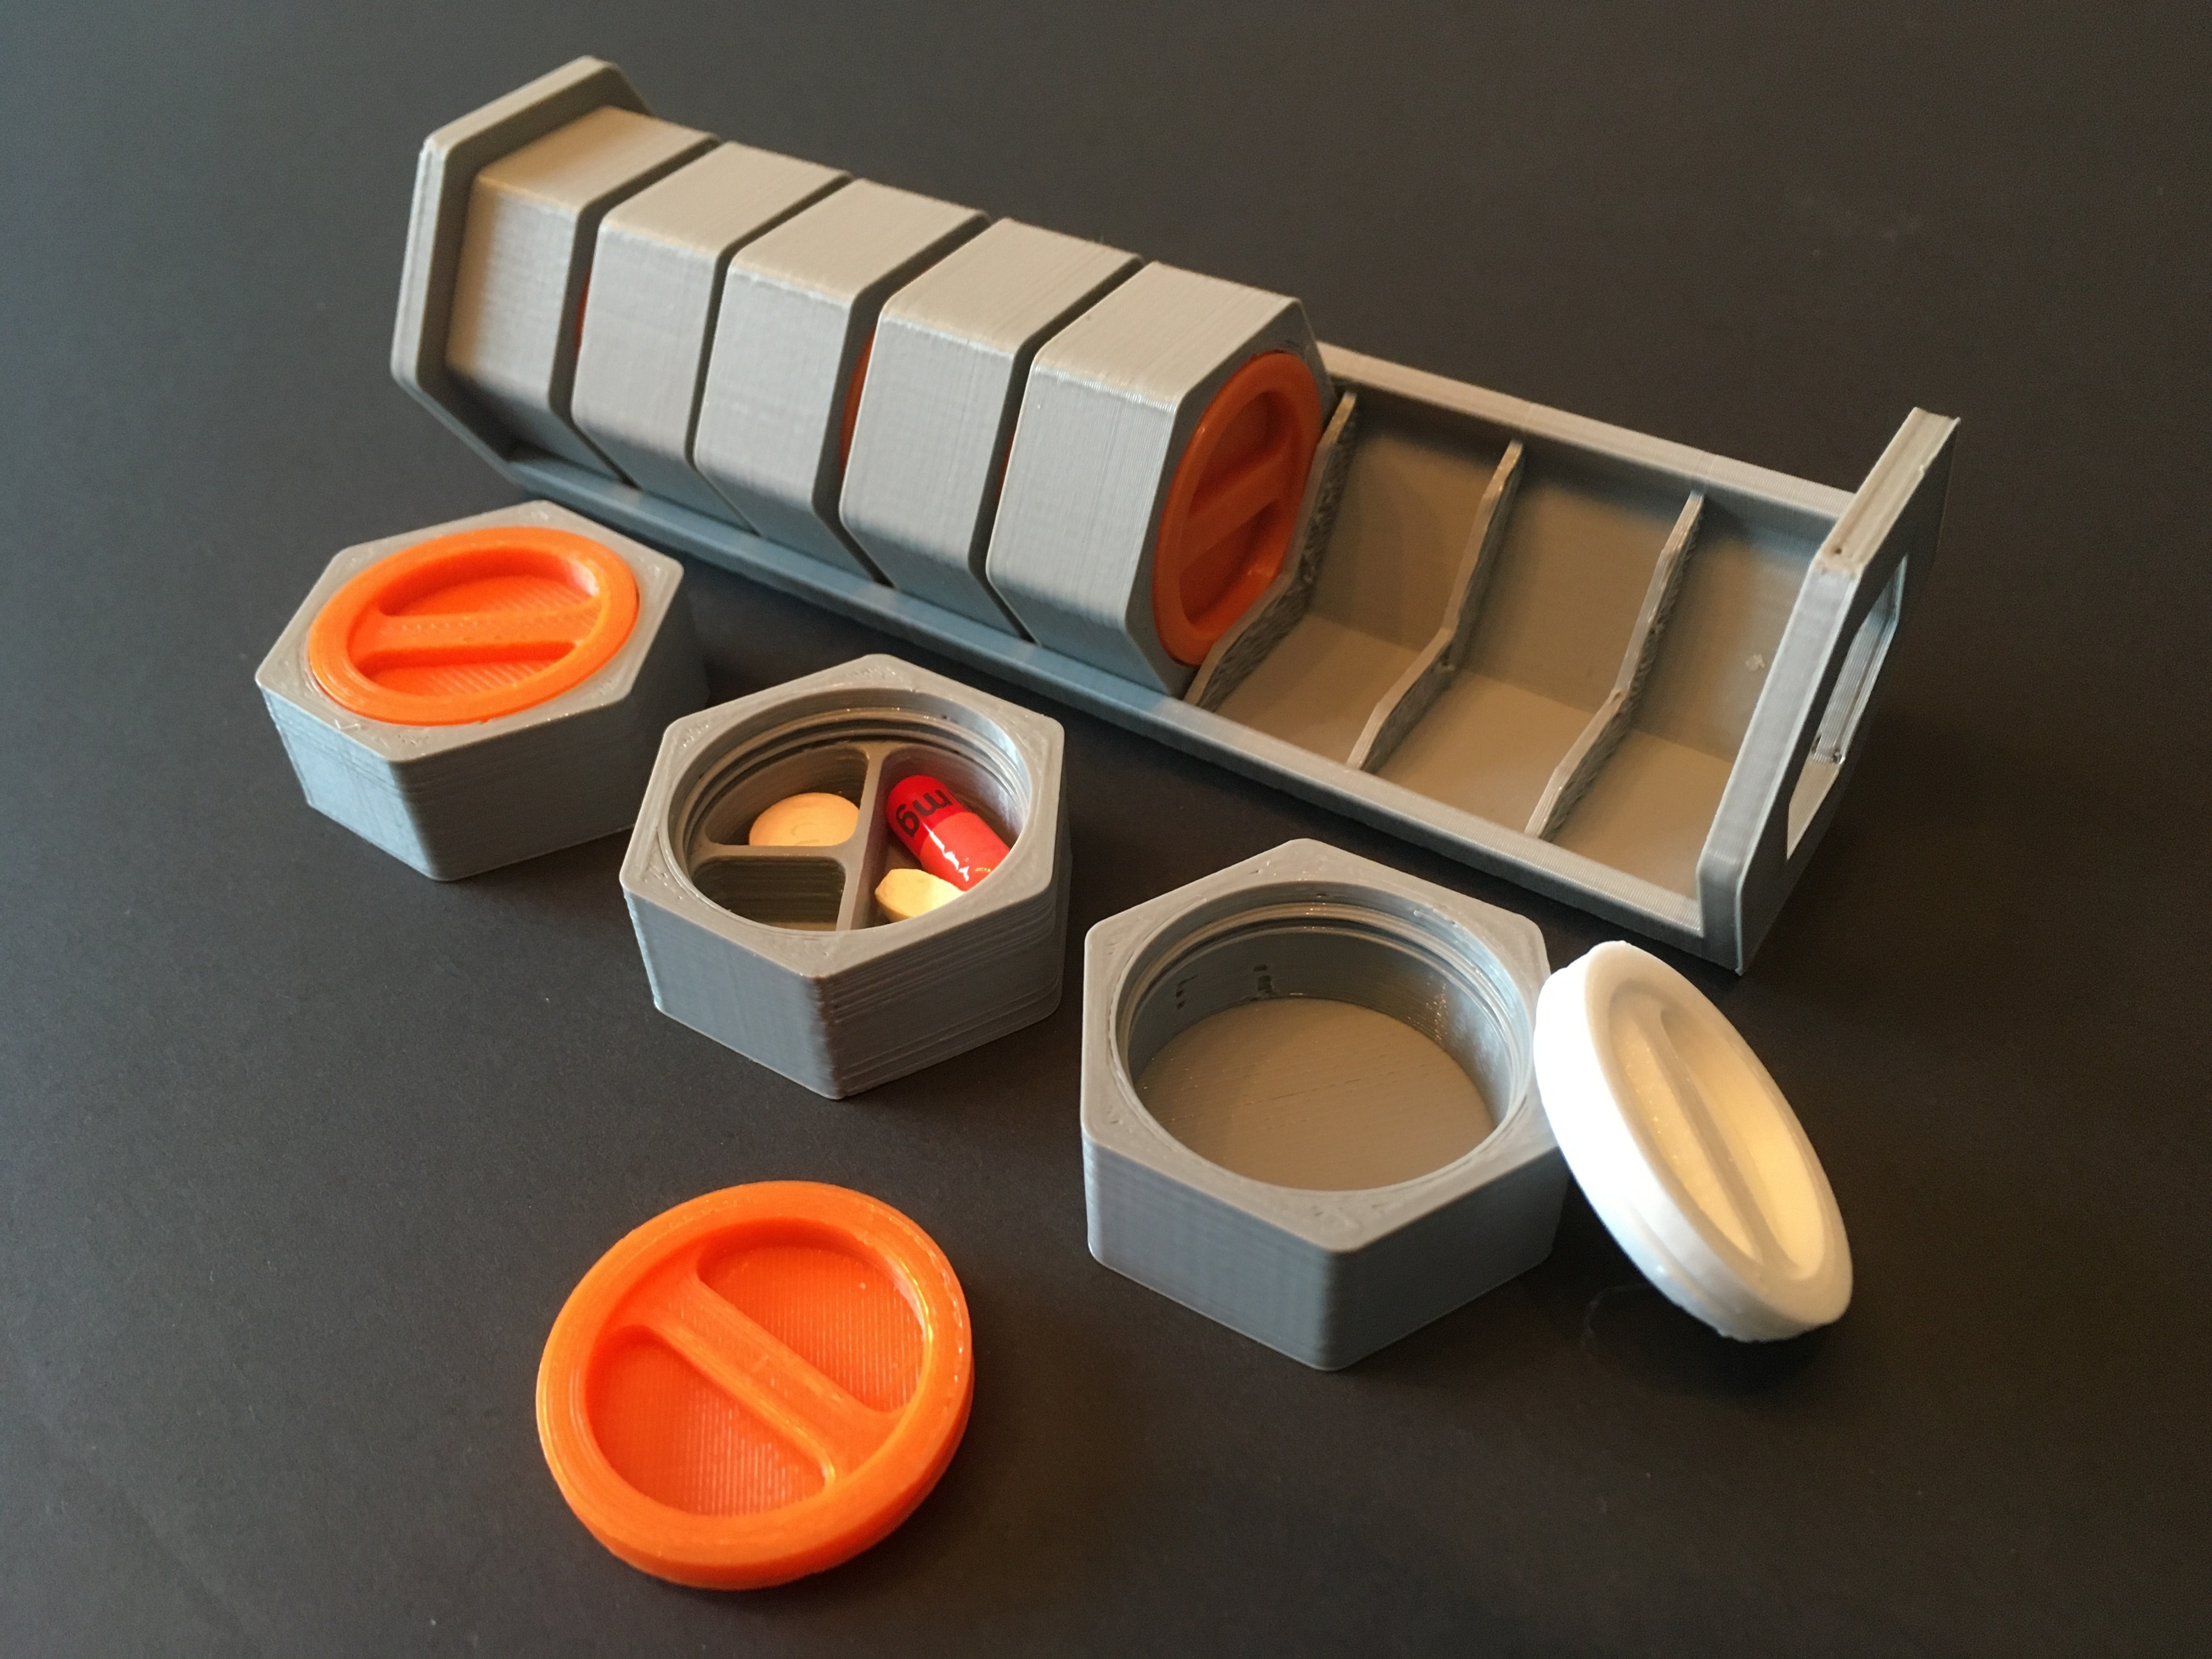 IMG-3584.JPG Download STL file HexaPill - Modular pillbox / pill dispenser • 3D printing design, yozz